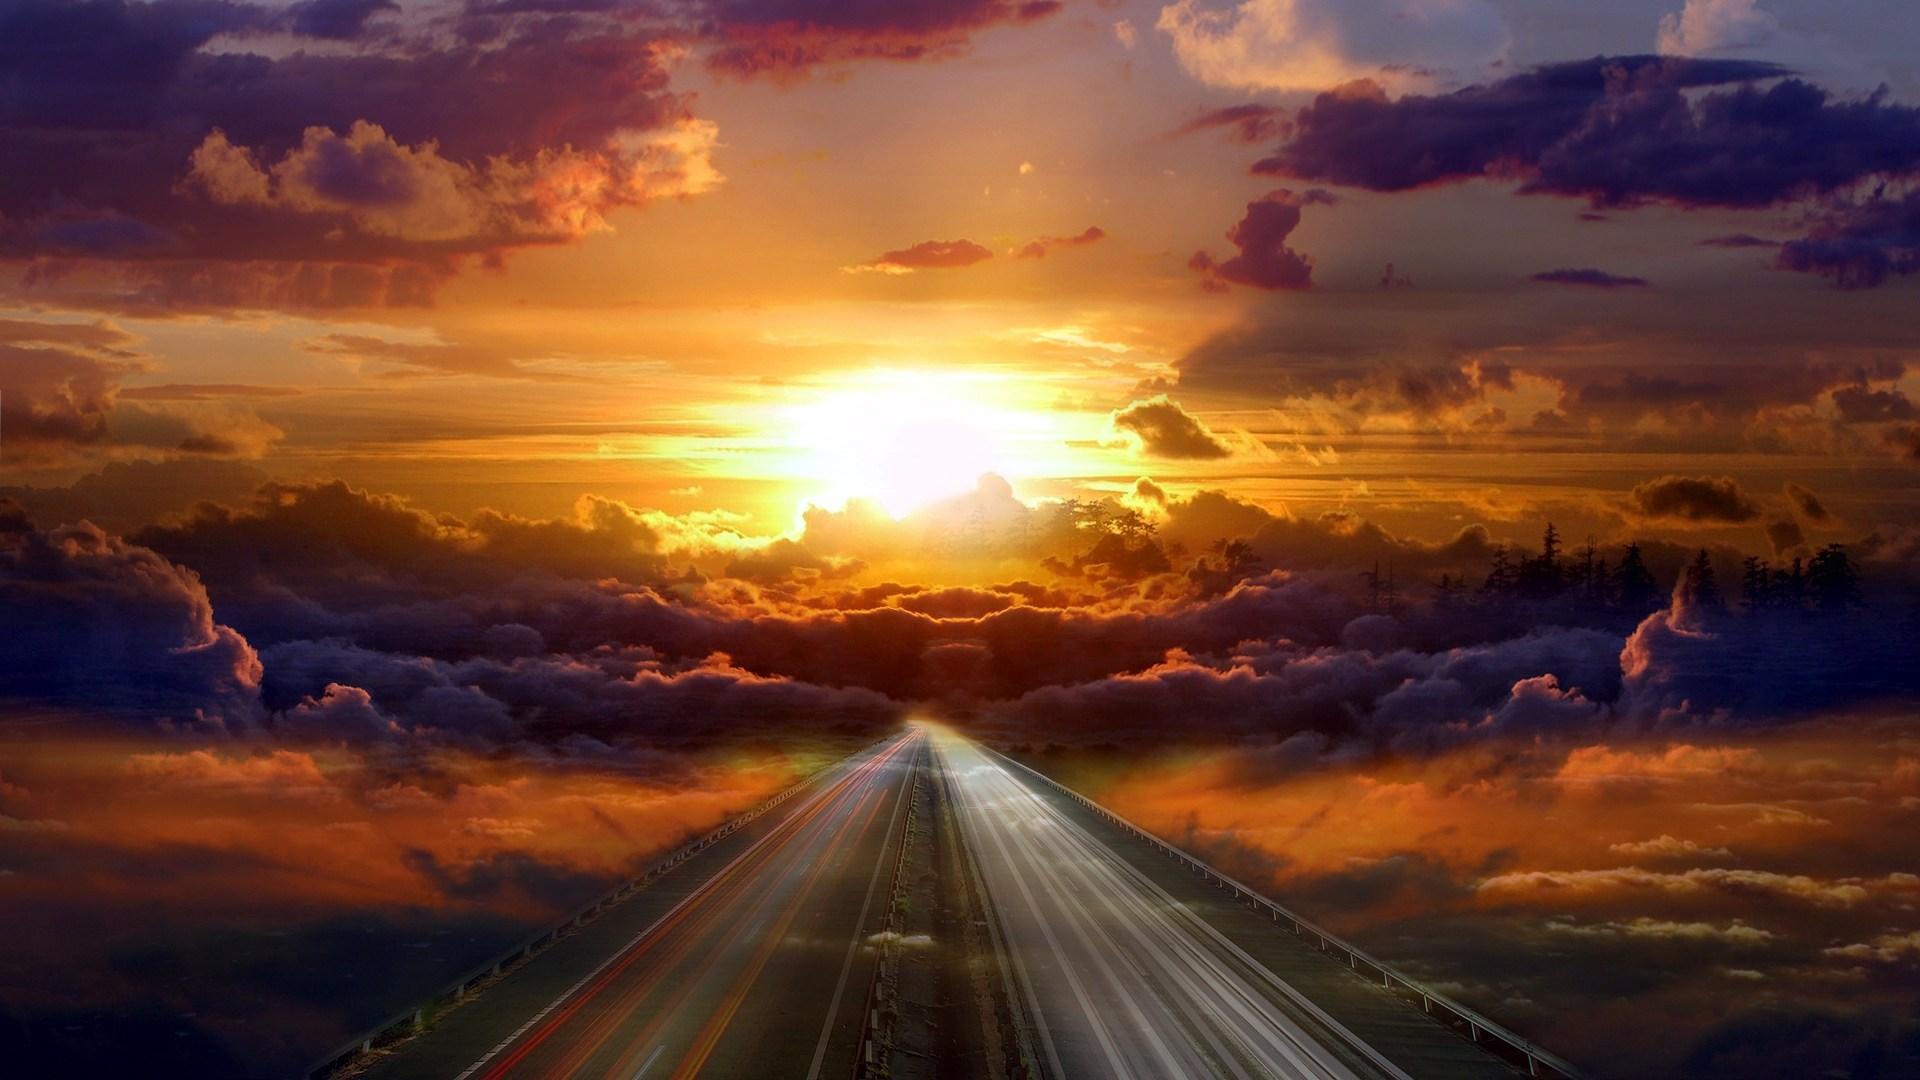 Road to heaven photo